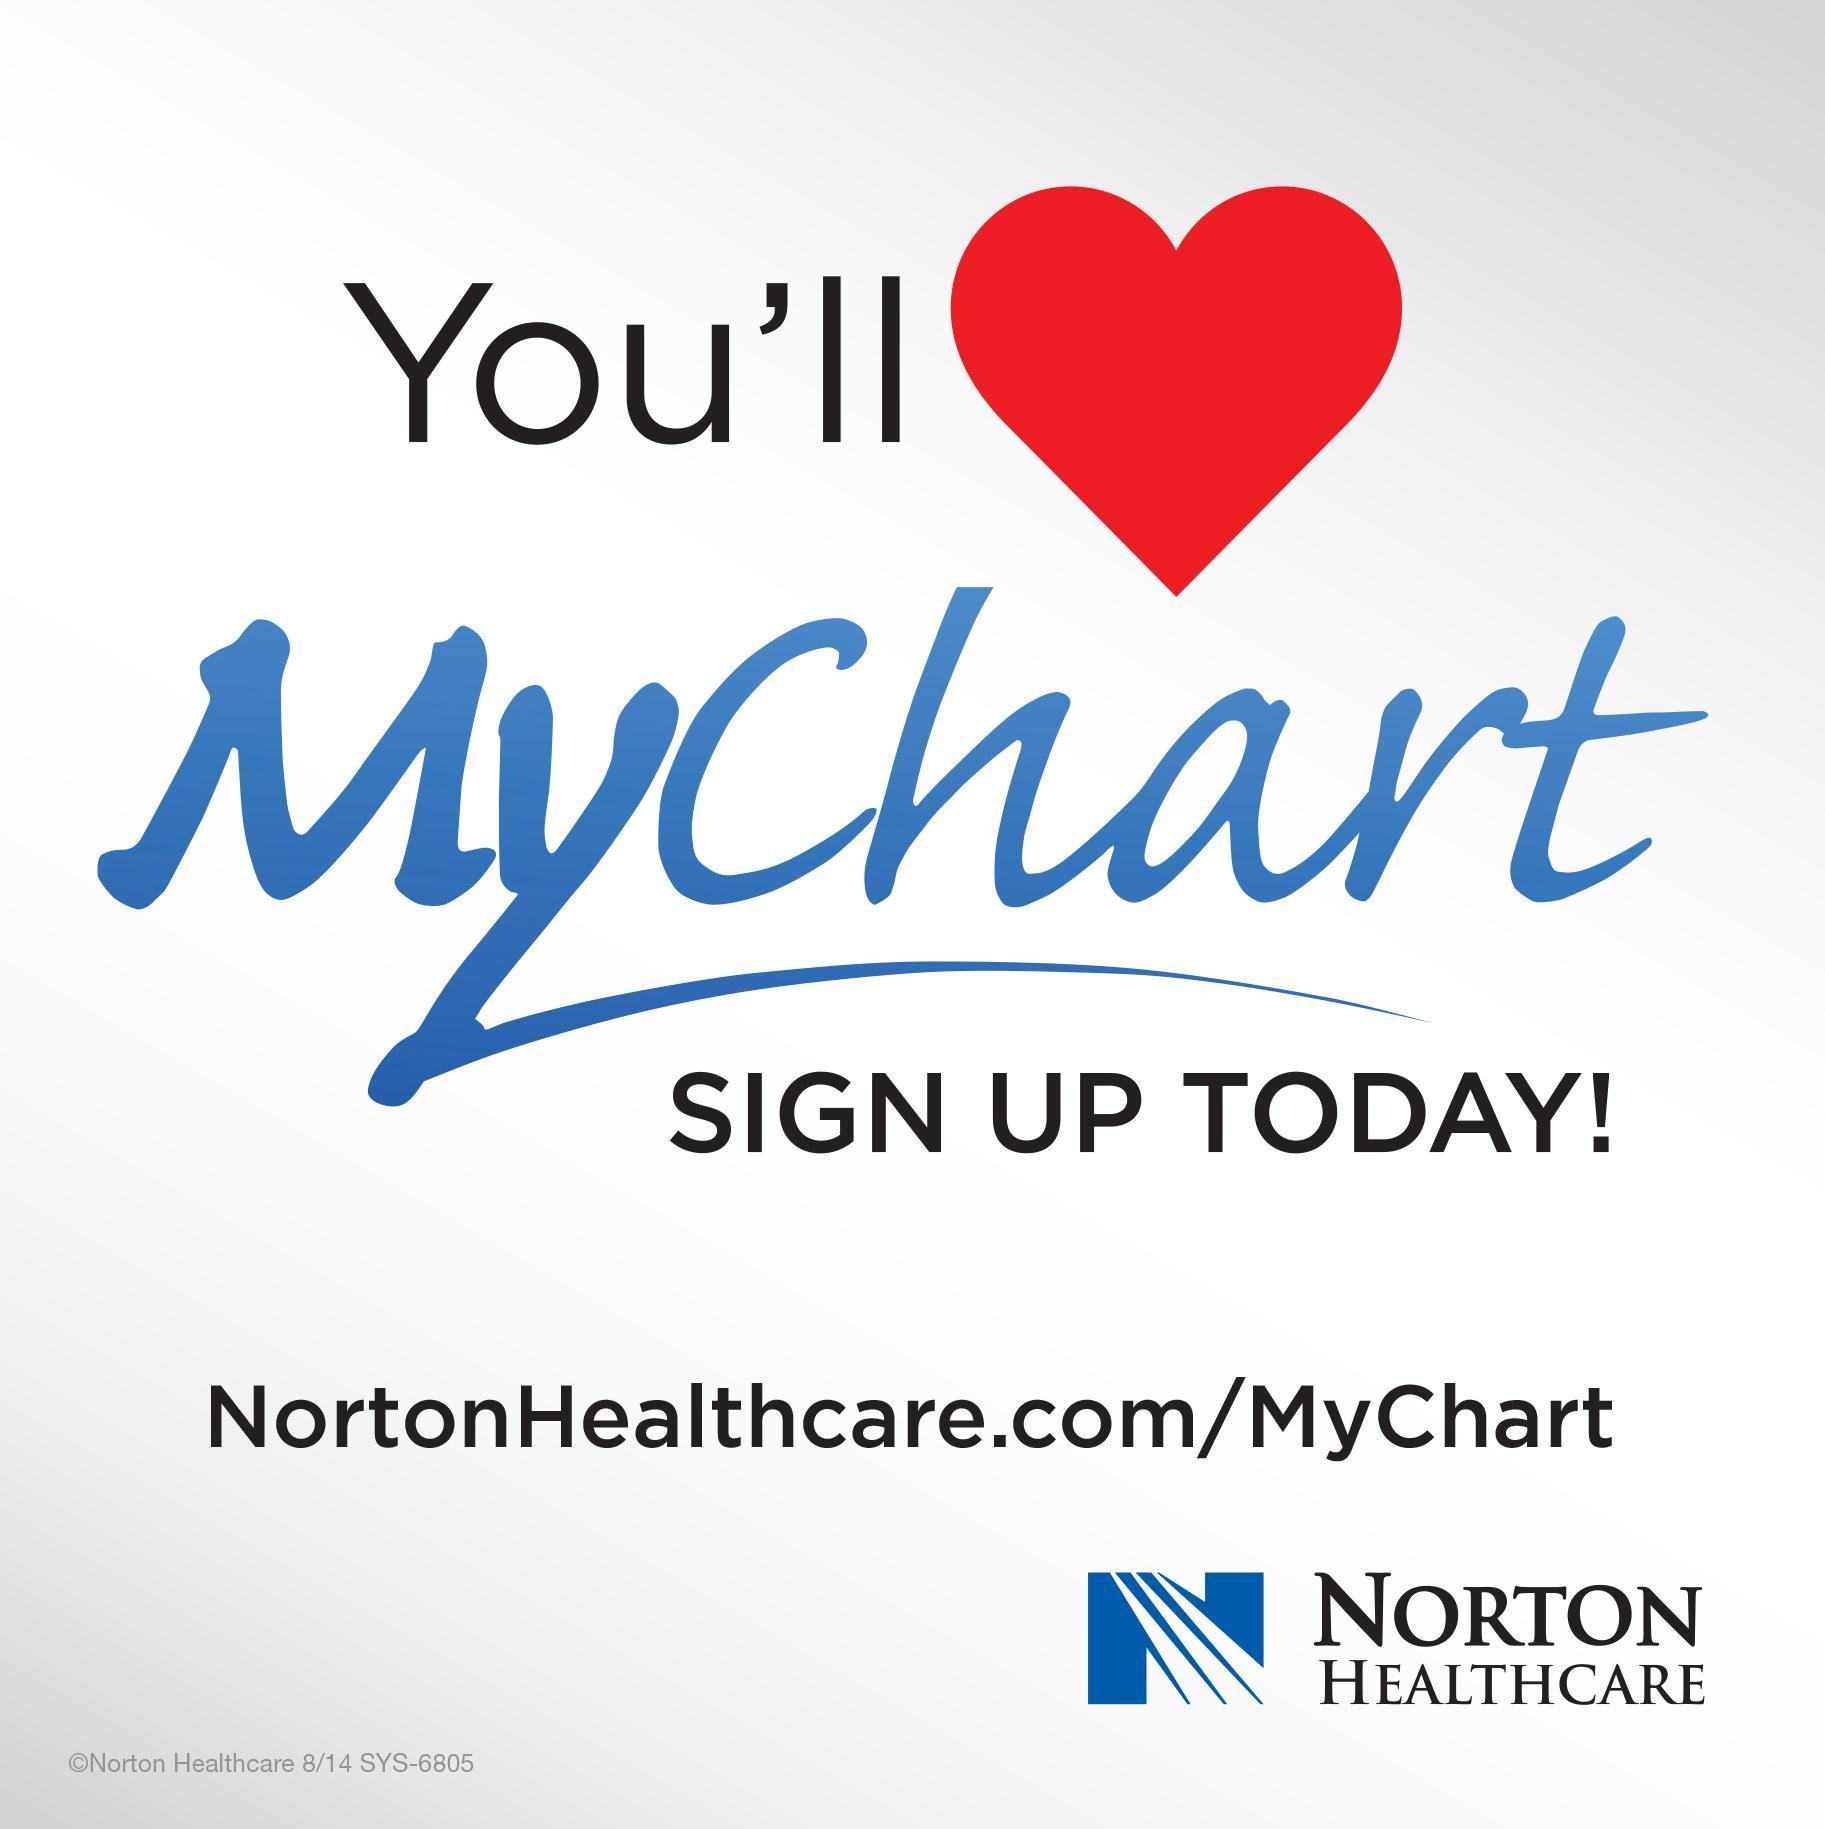 Norton healthcare louisville ky my chart with mynortonchart